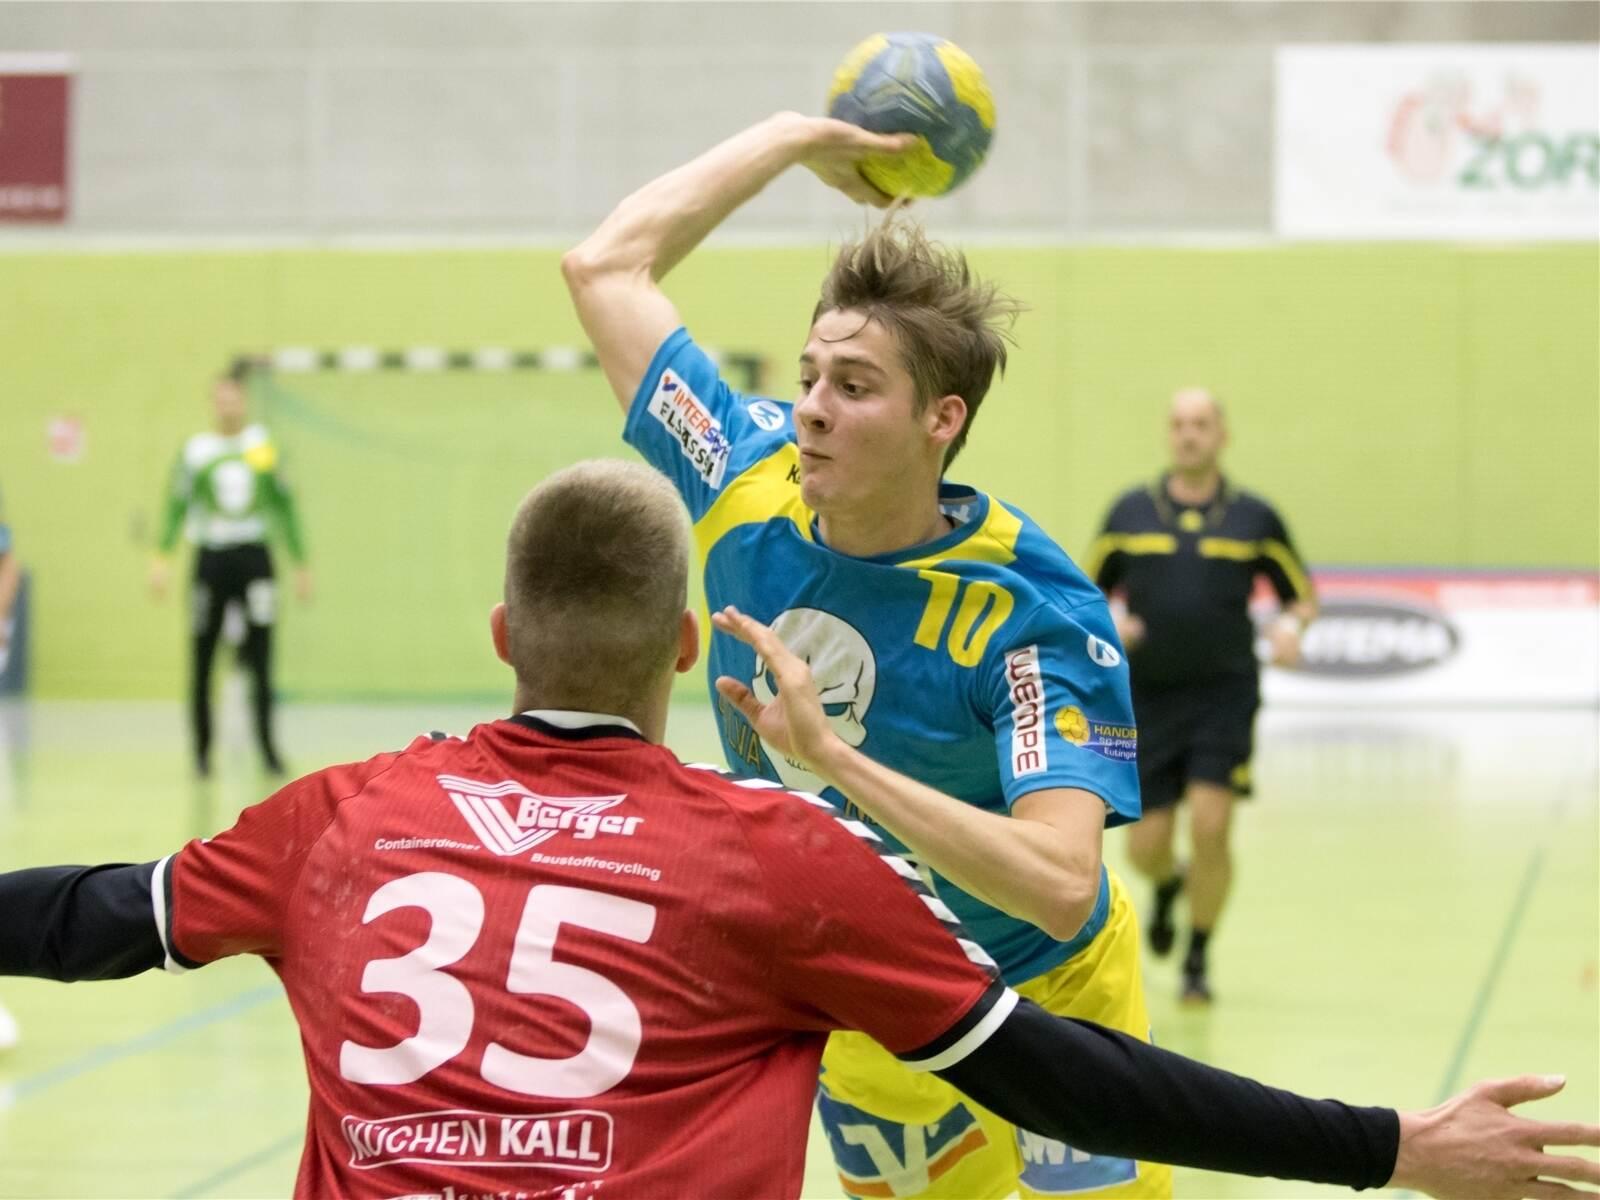 Handball: Heimstarke SG-Reserve, TGS II und Ispringen auswärts chancenlos - Sport - Pforzheimer-Zeitung - Pforzheimer Zeitung